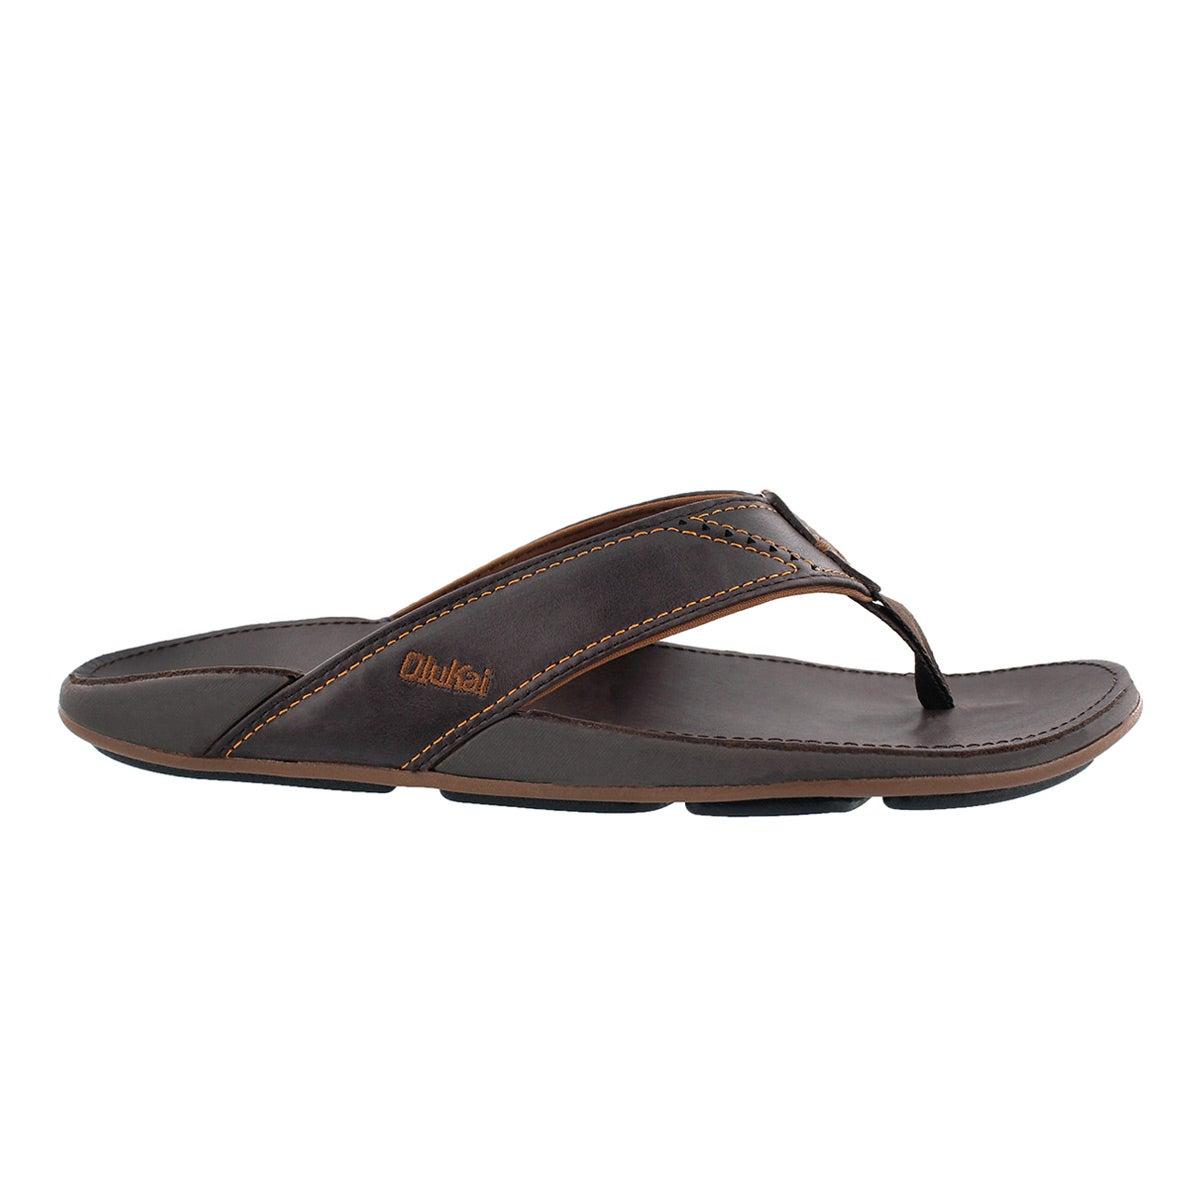 Mns Nui dark java thong sandal